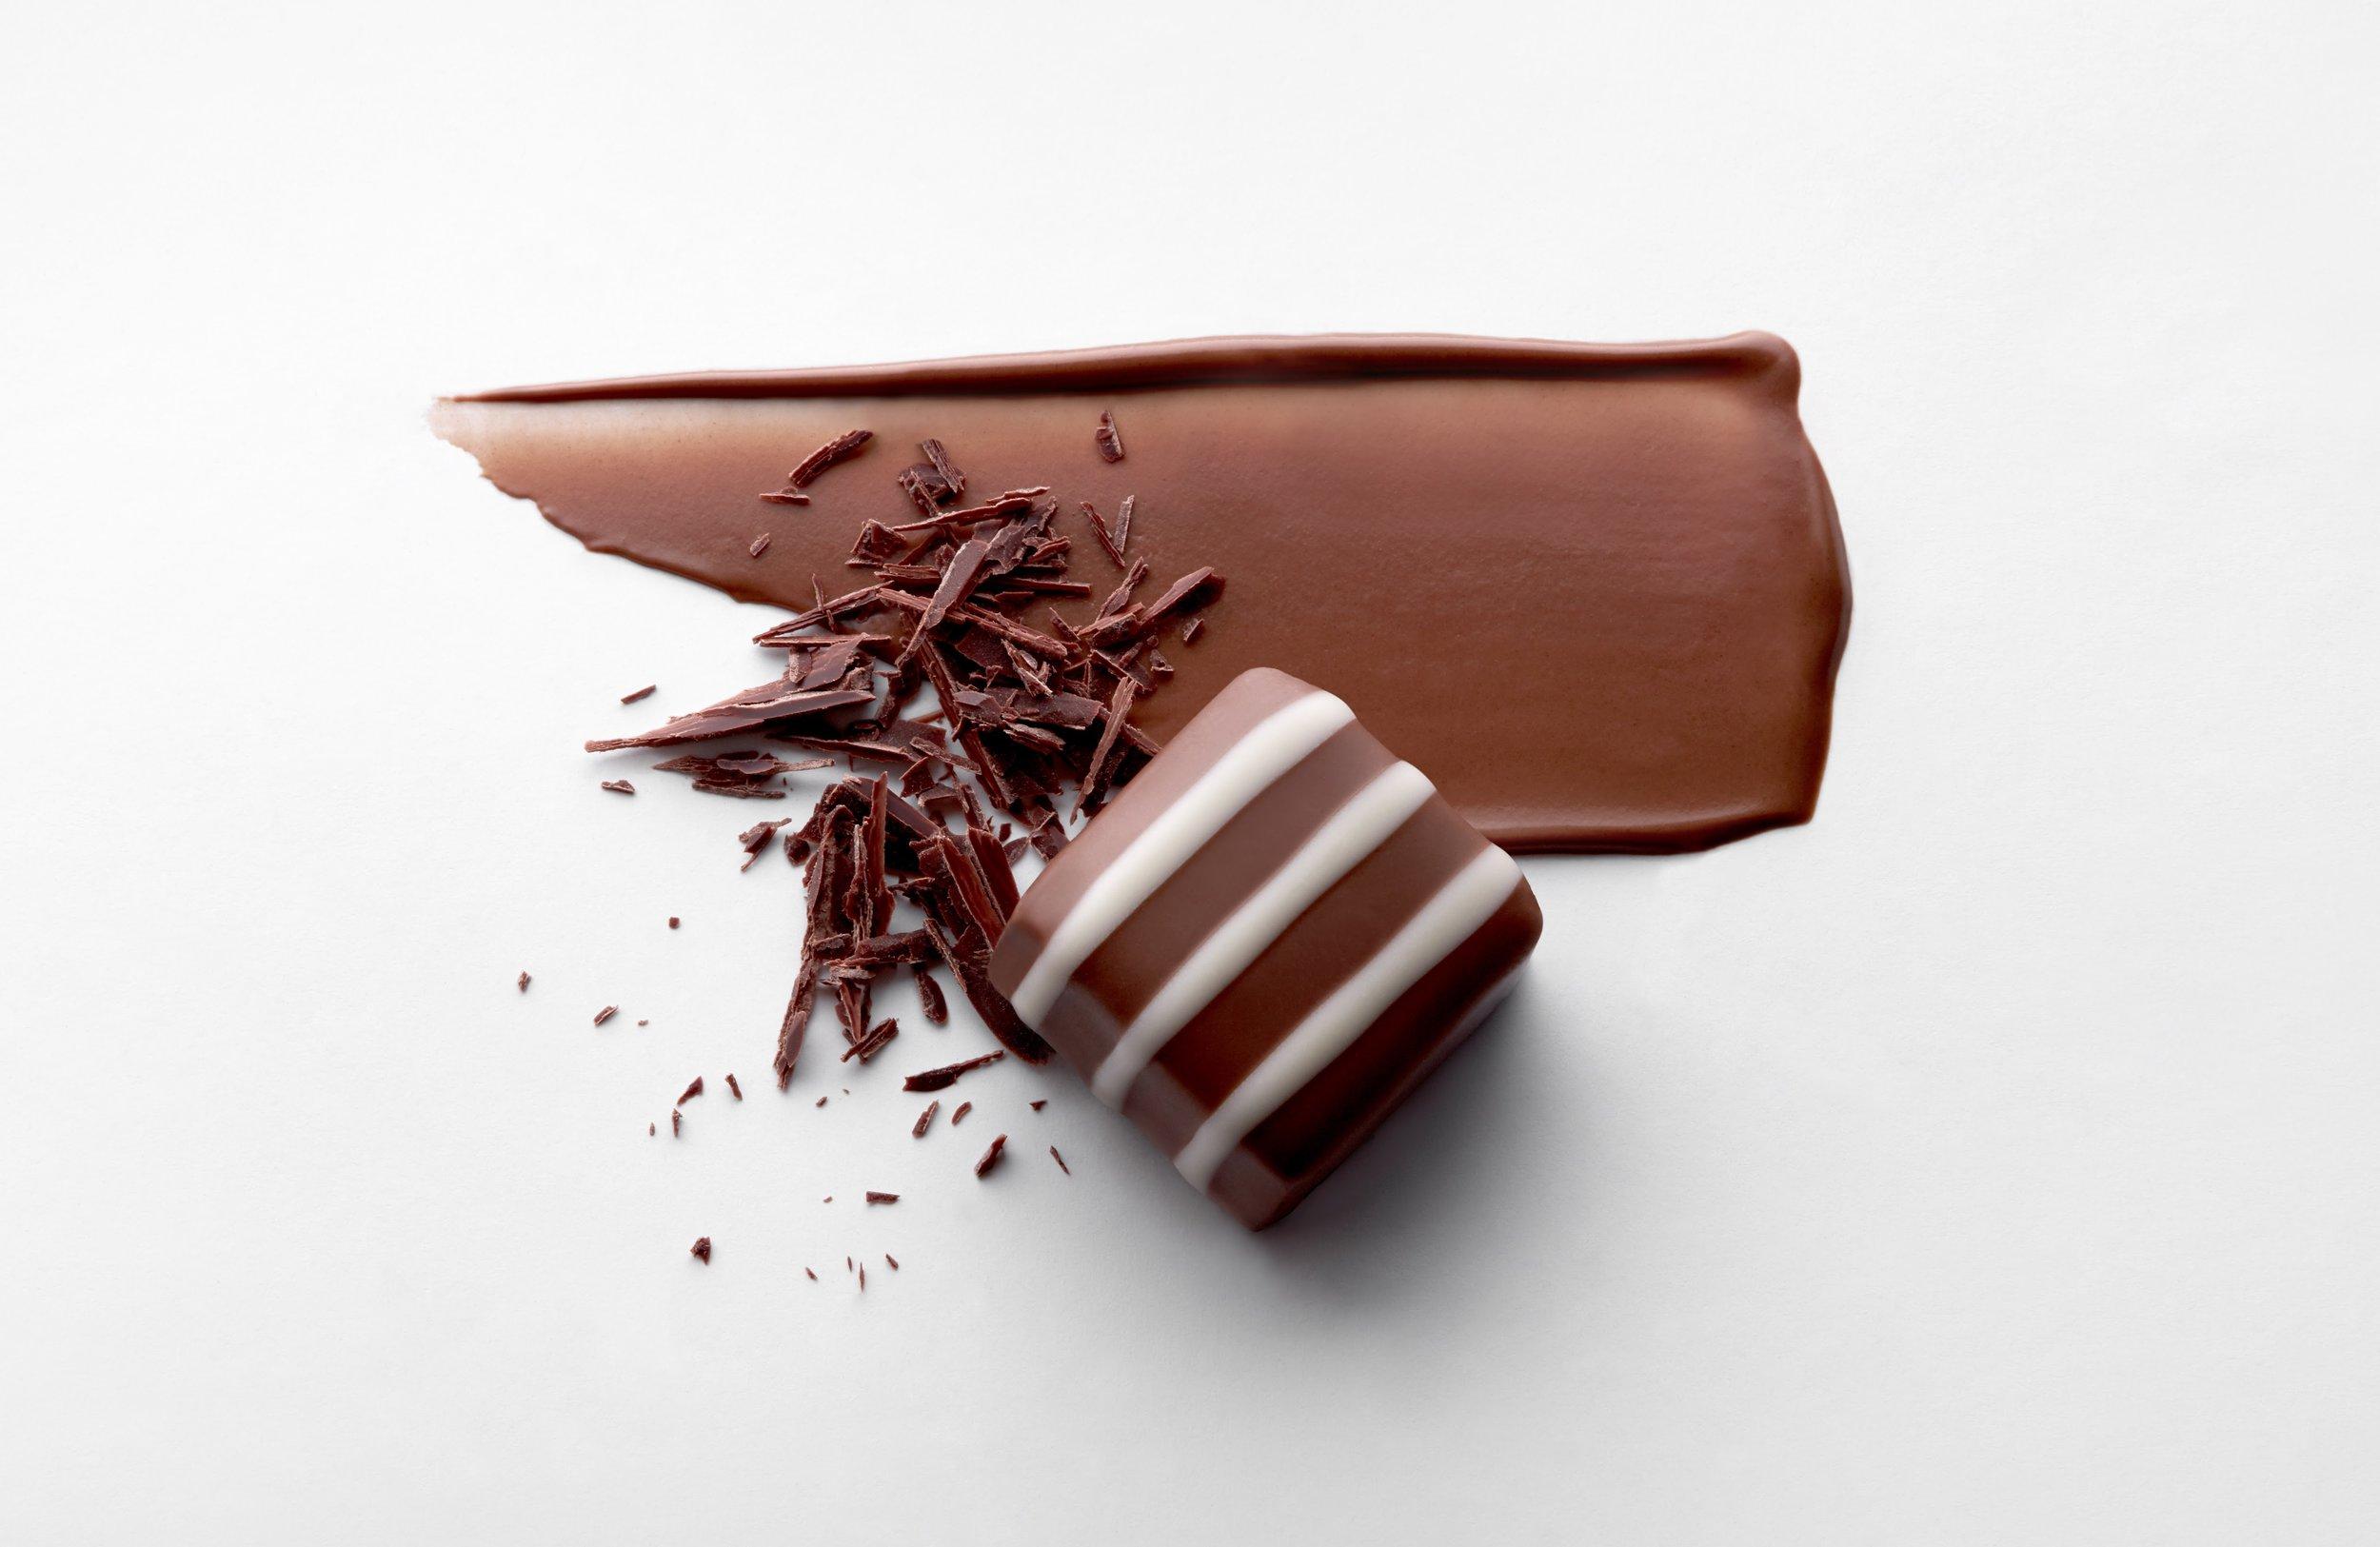 Zuki_Turner_Creative Direction_chocolate-smears-swatches-creative-food-still-life-photographer-london-photography-1.jpg